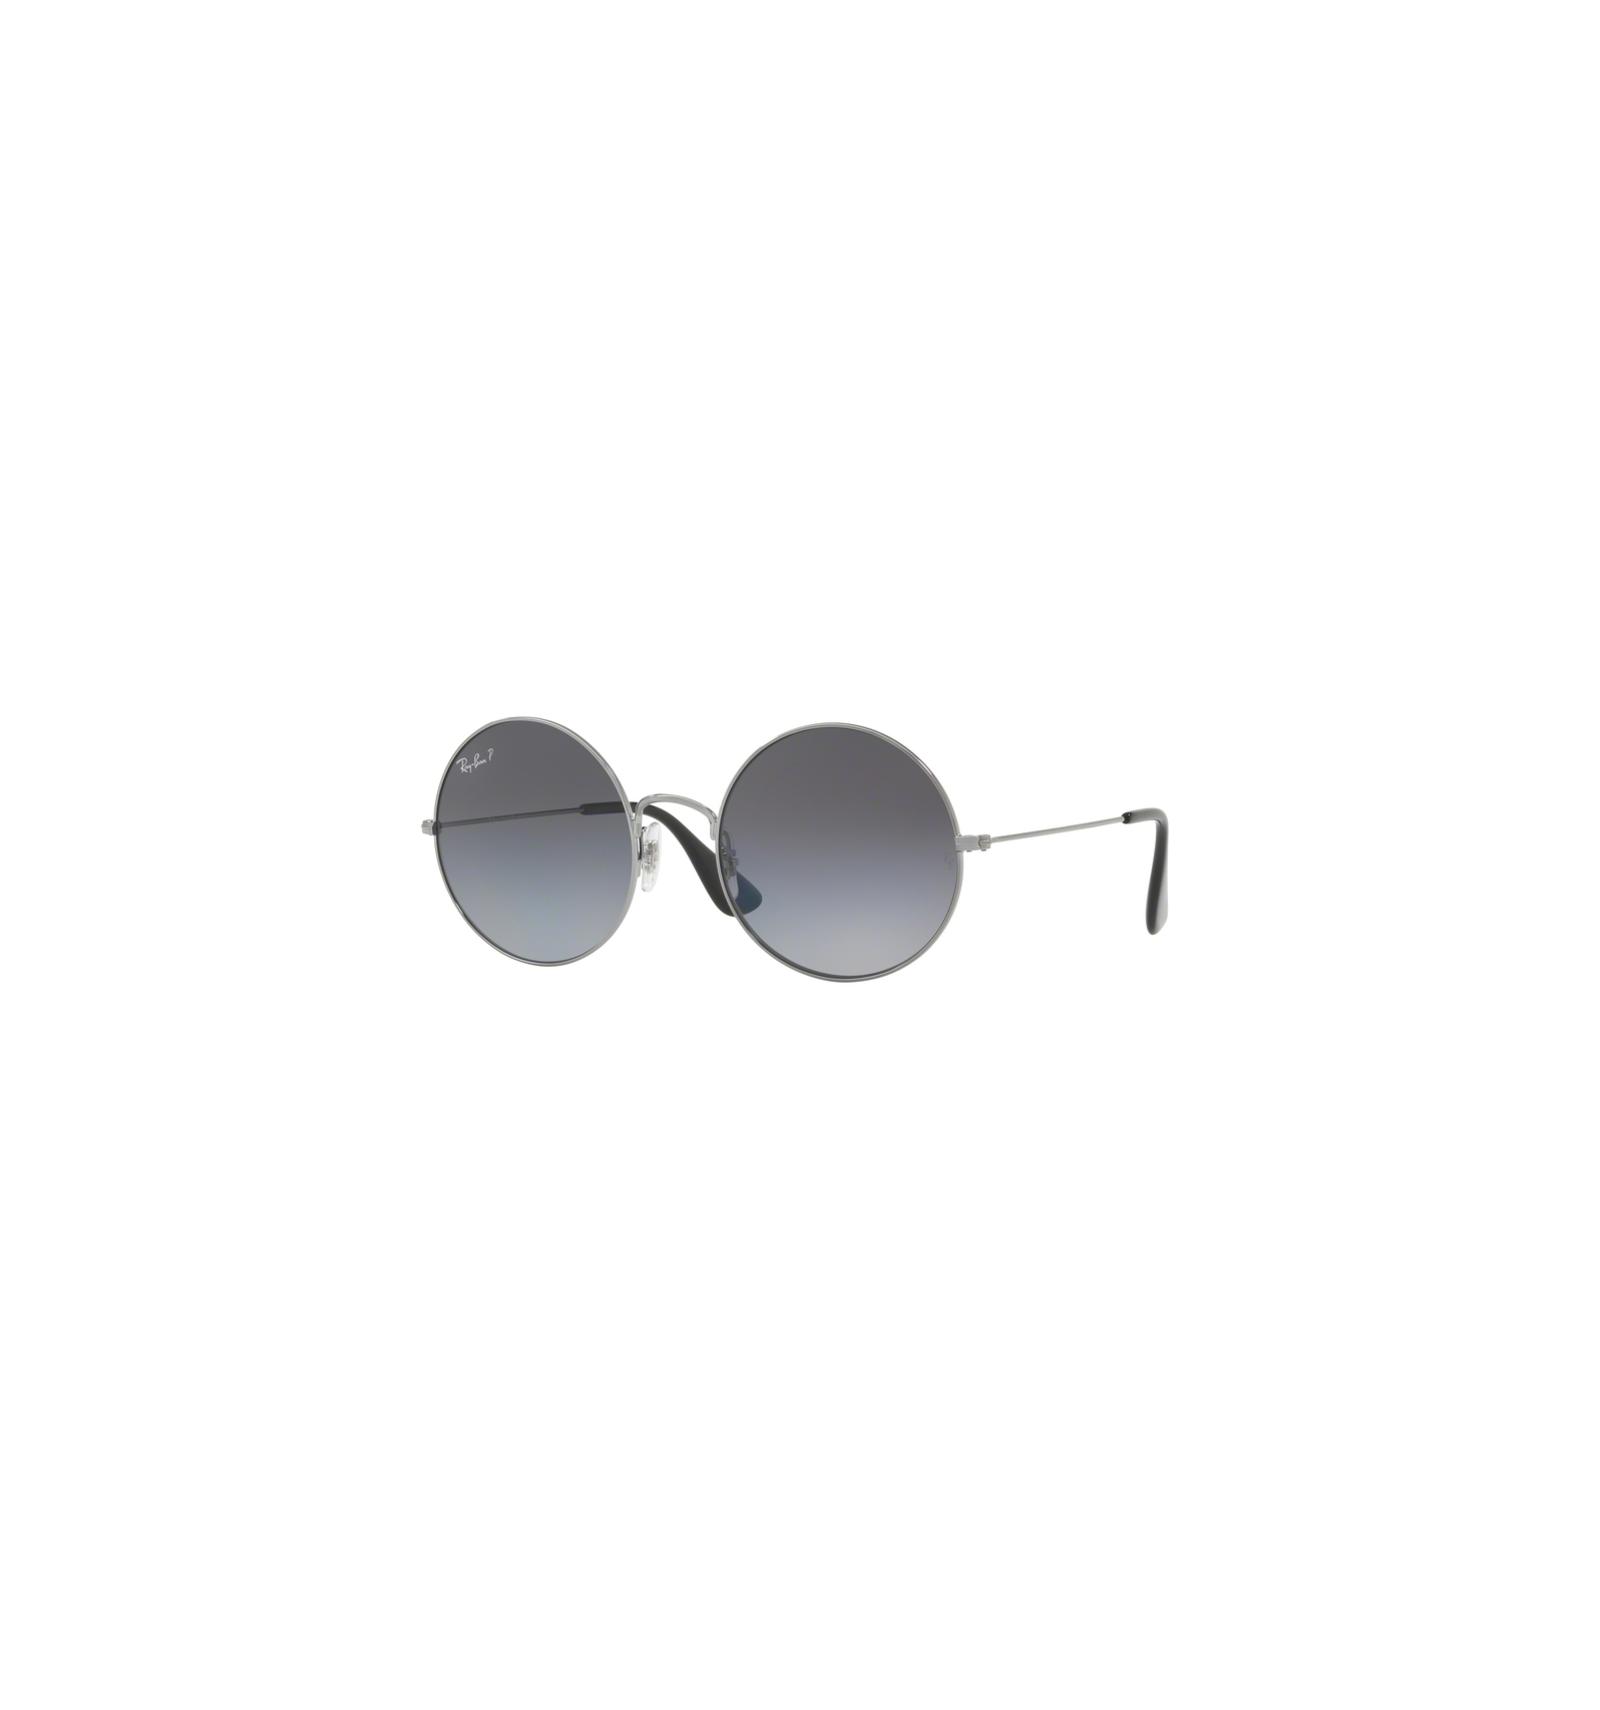 Gafas de sol RAY BAN RB3592 JA JO Silver - Grey Polarized cc605256d7